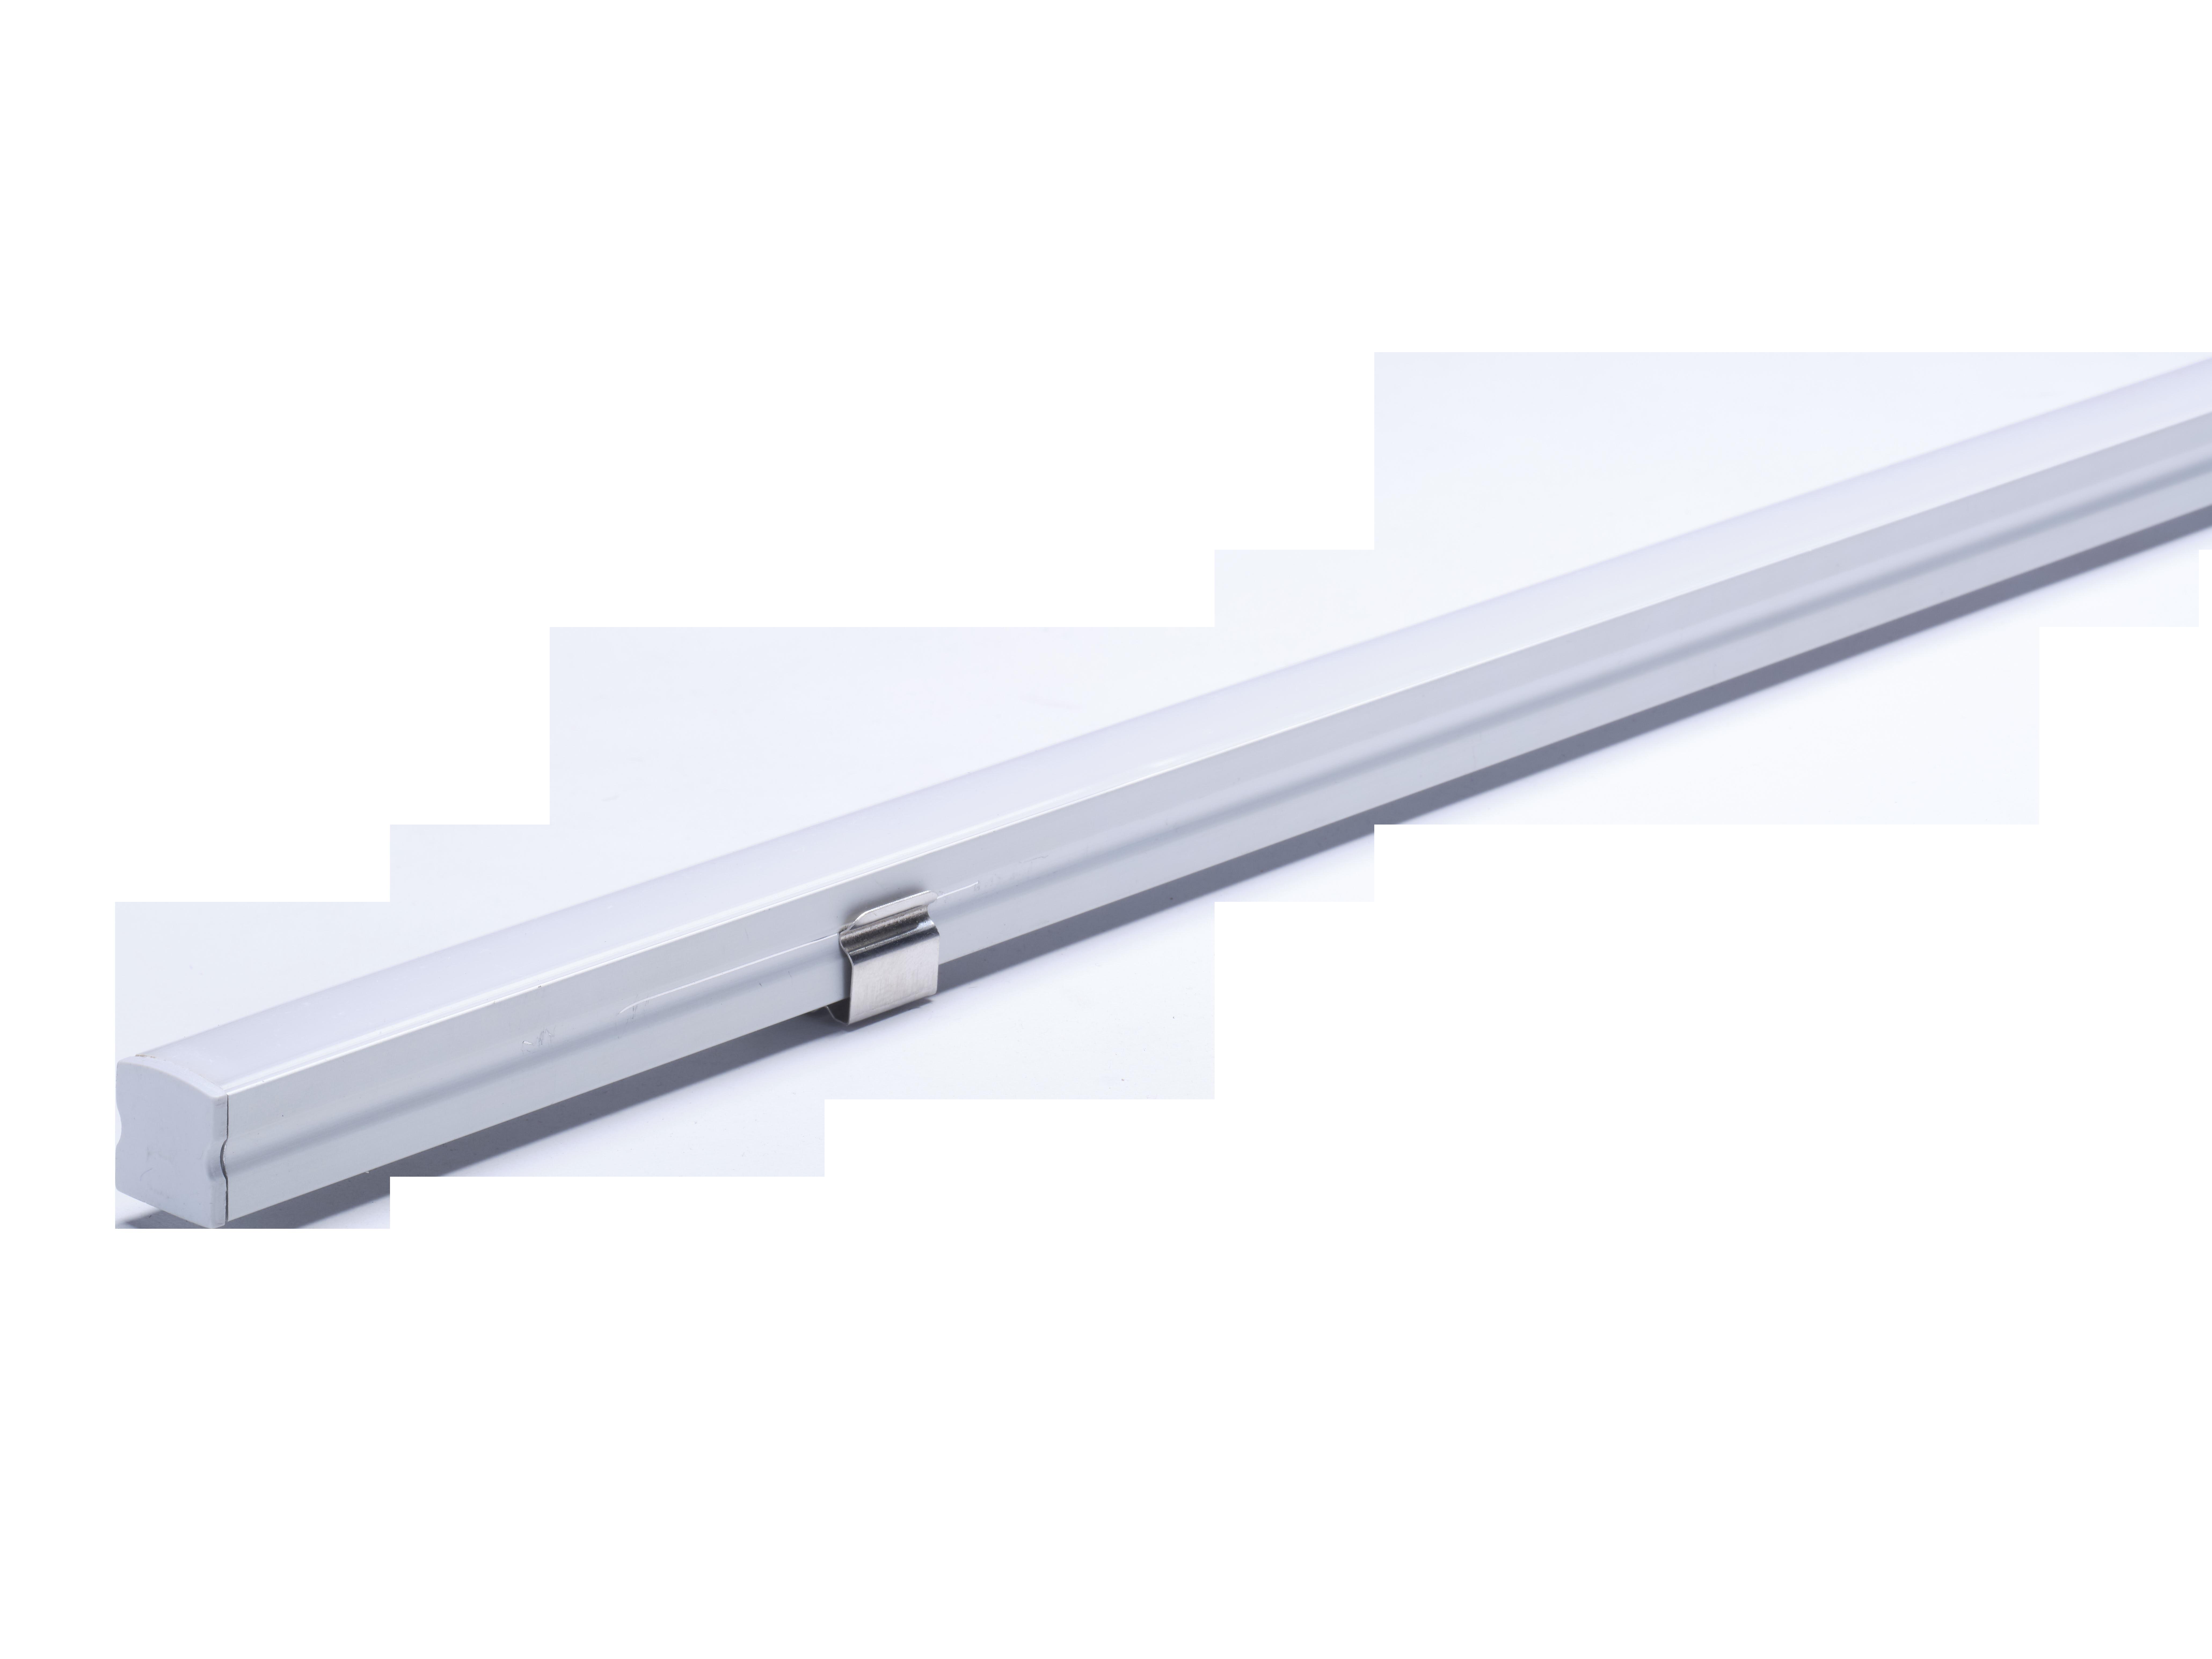 C'NNECT Linear Alpha Profile Lights